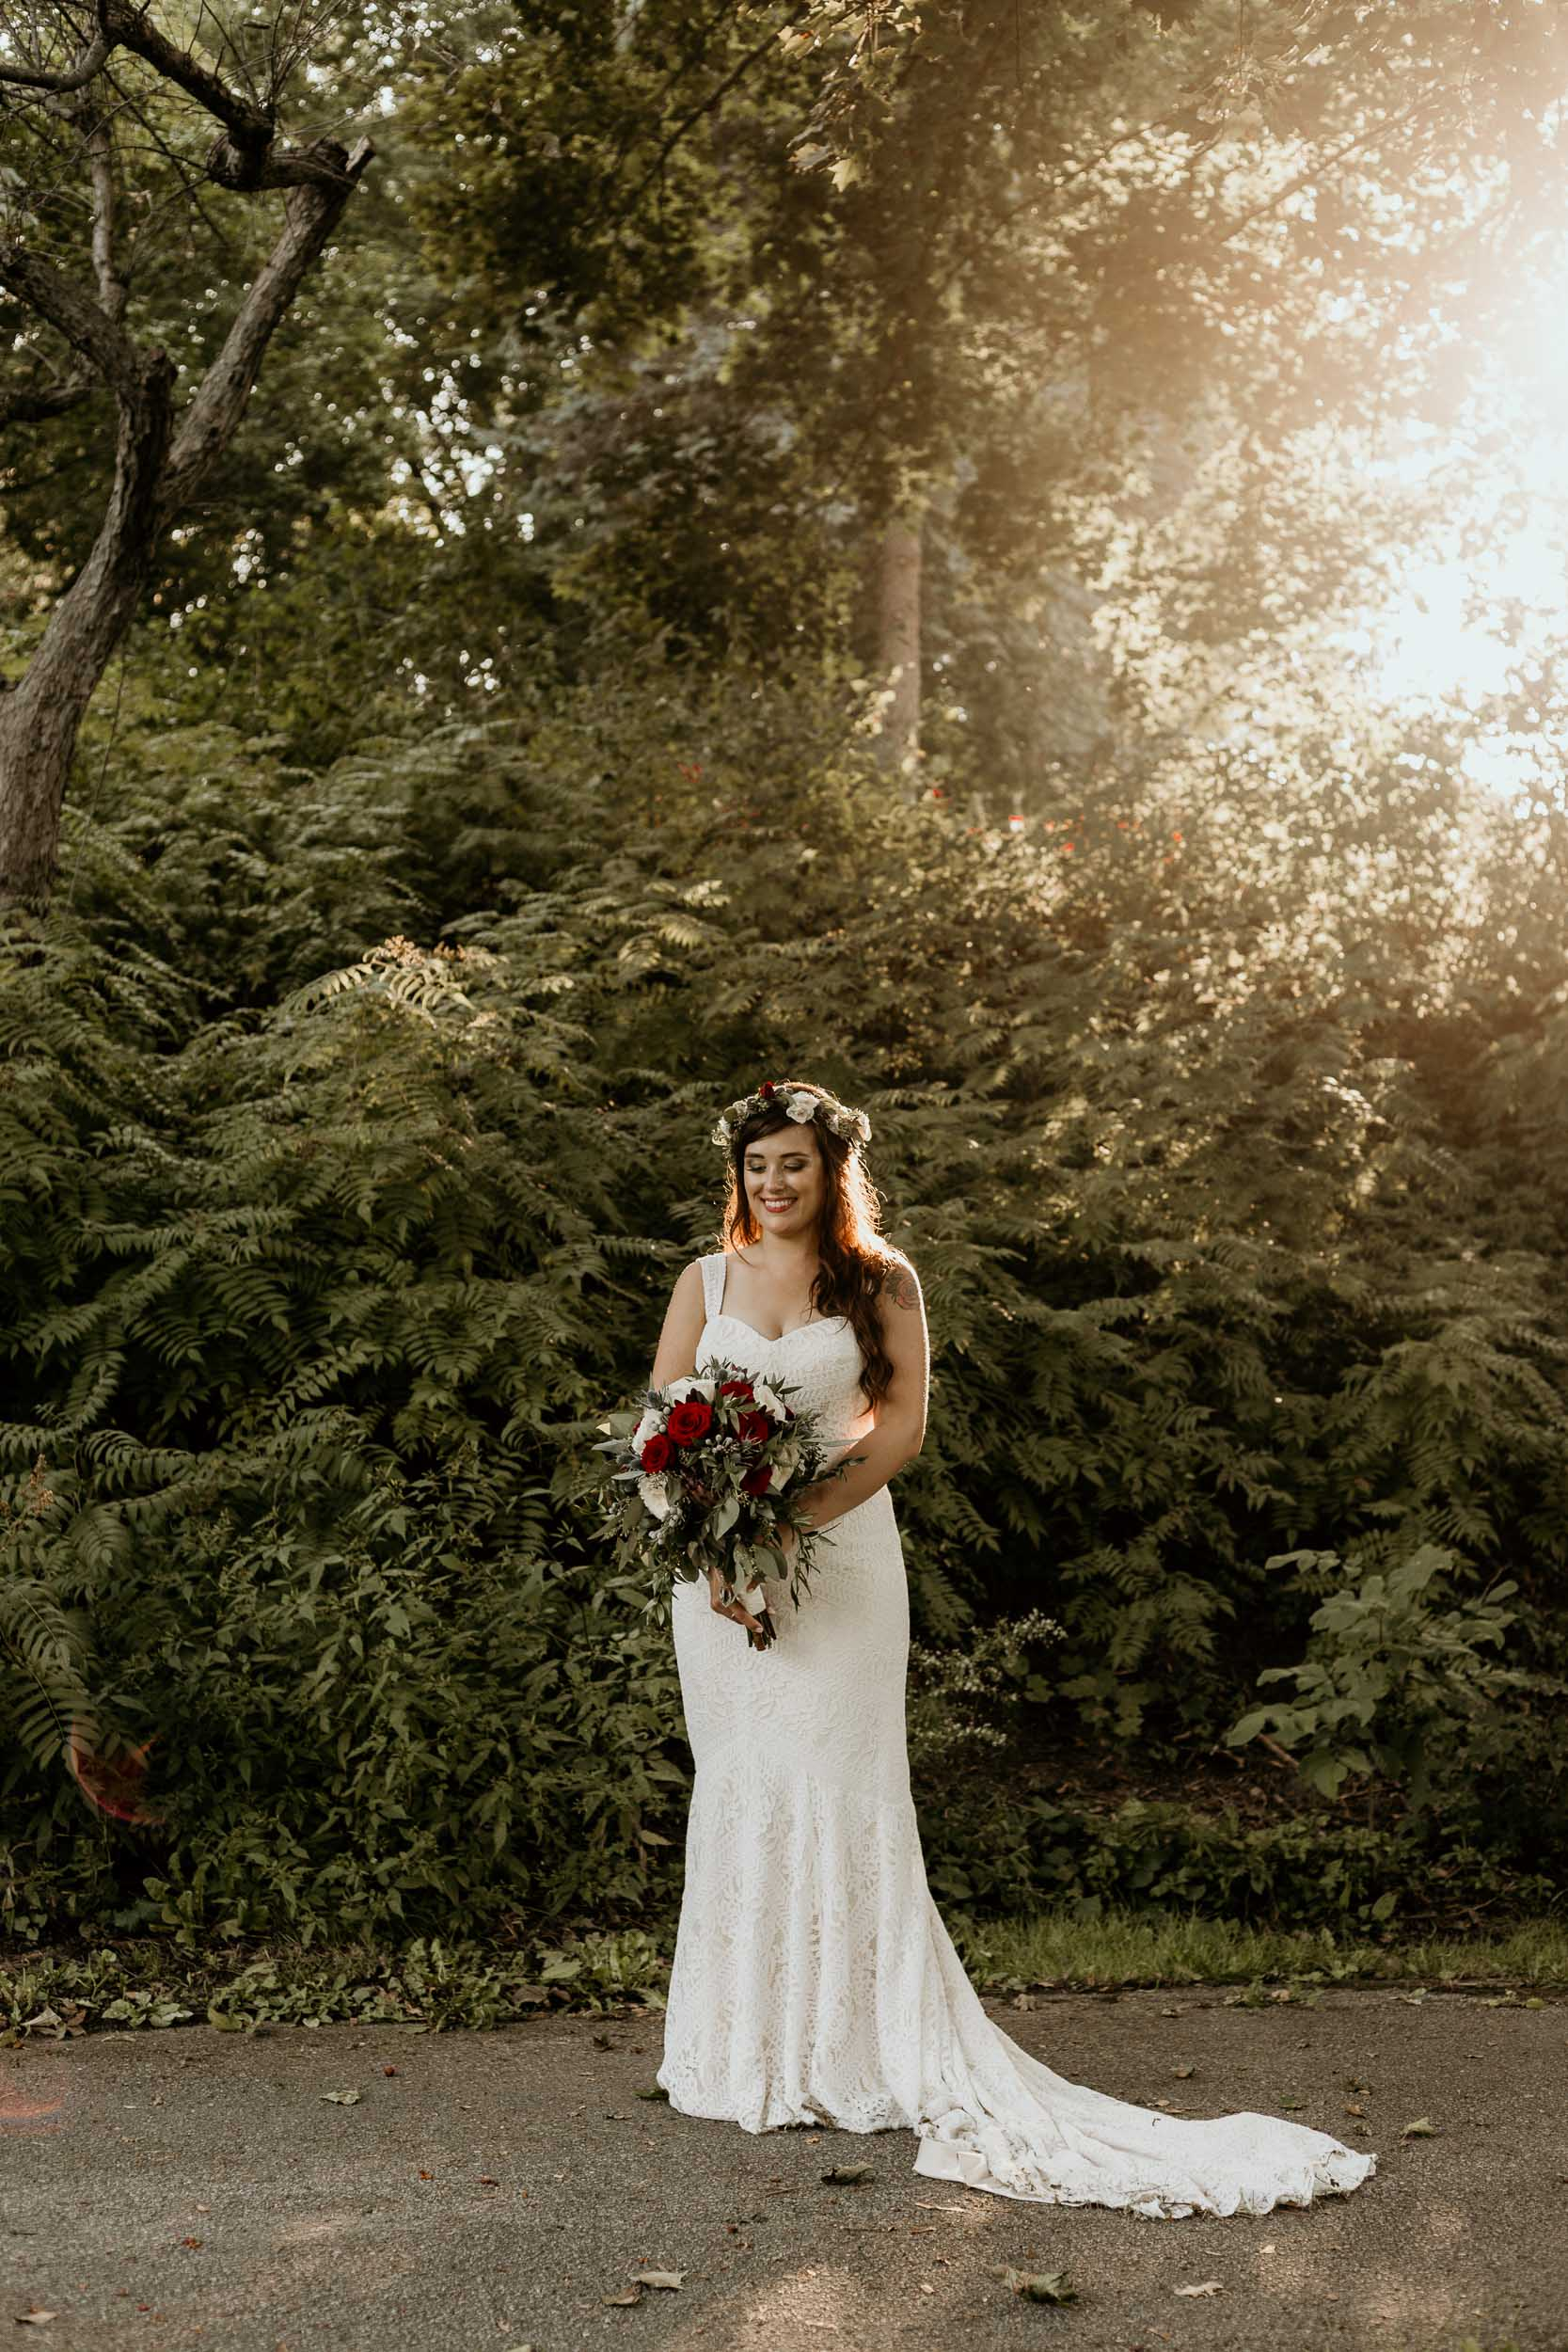 intimate-wedding-elopement-photographer-ottawa-toronto-7879.jpg